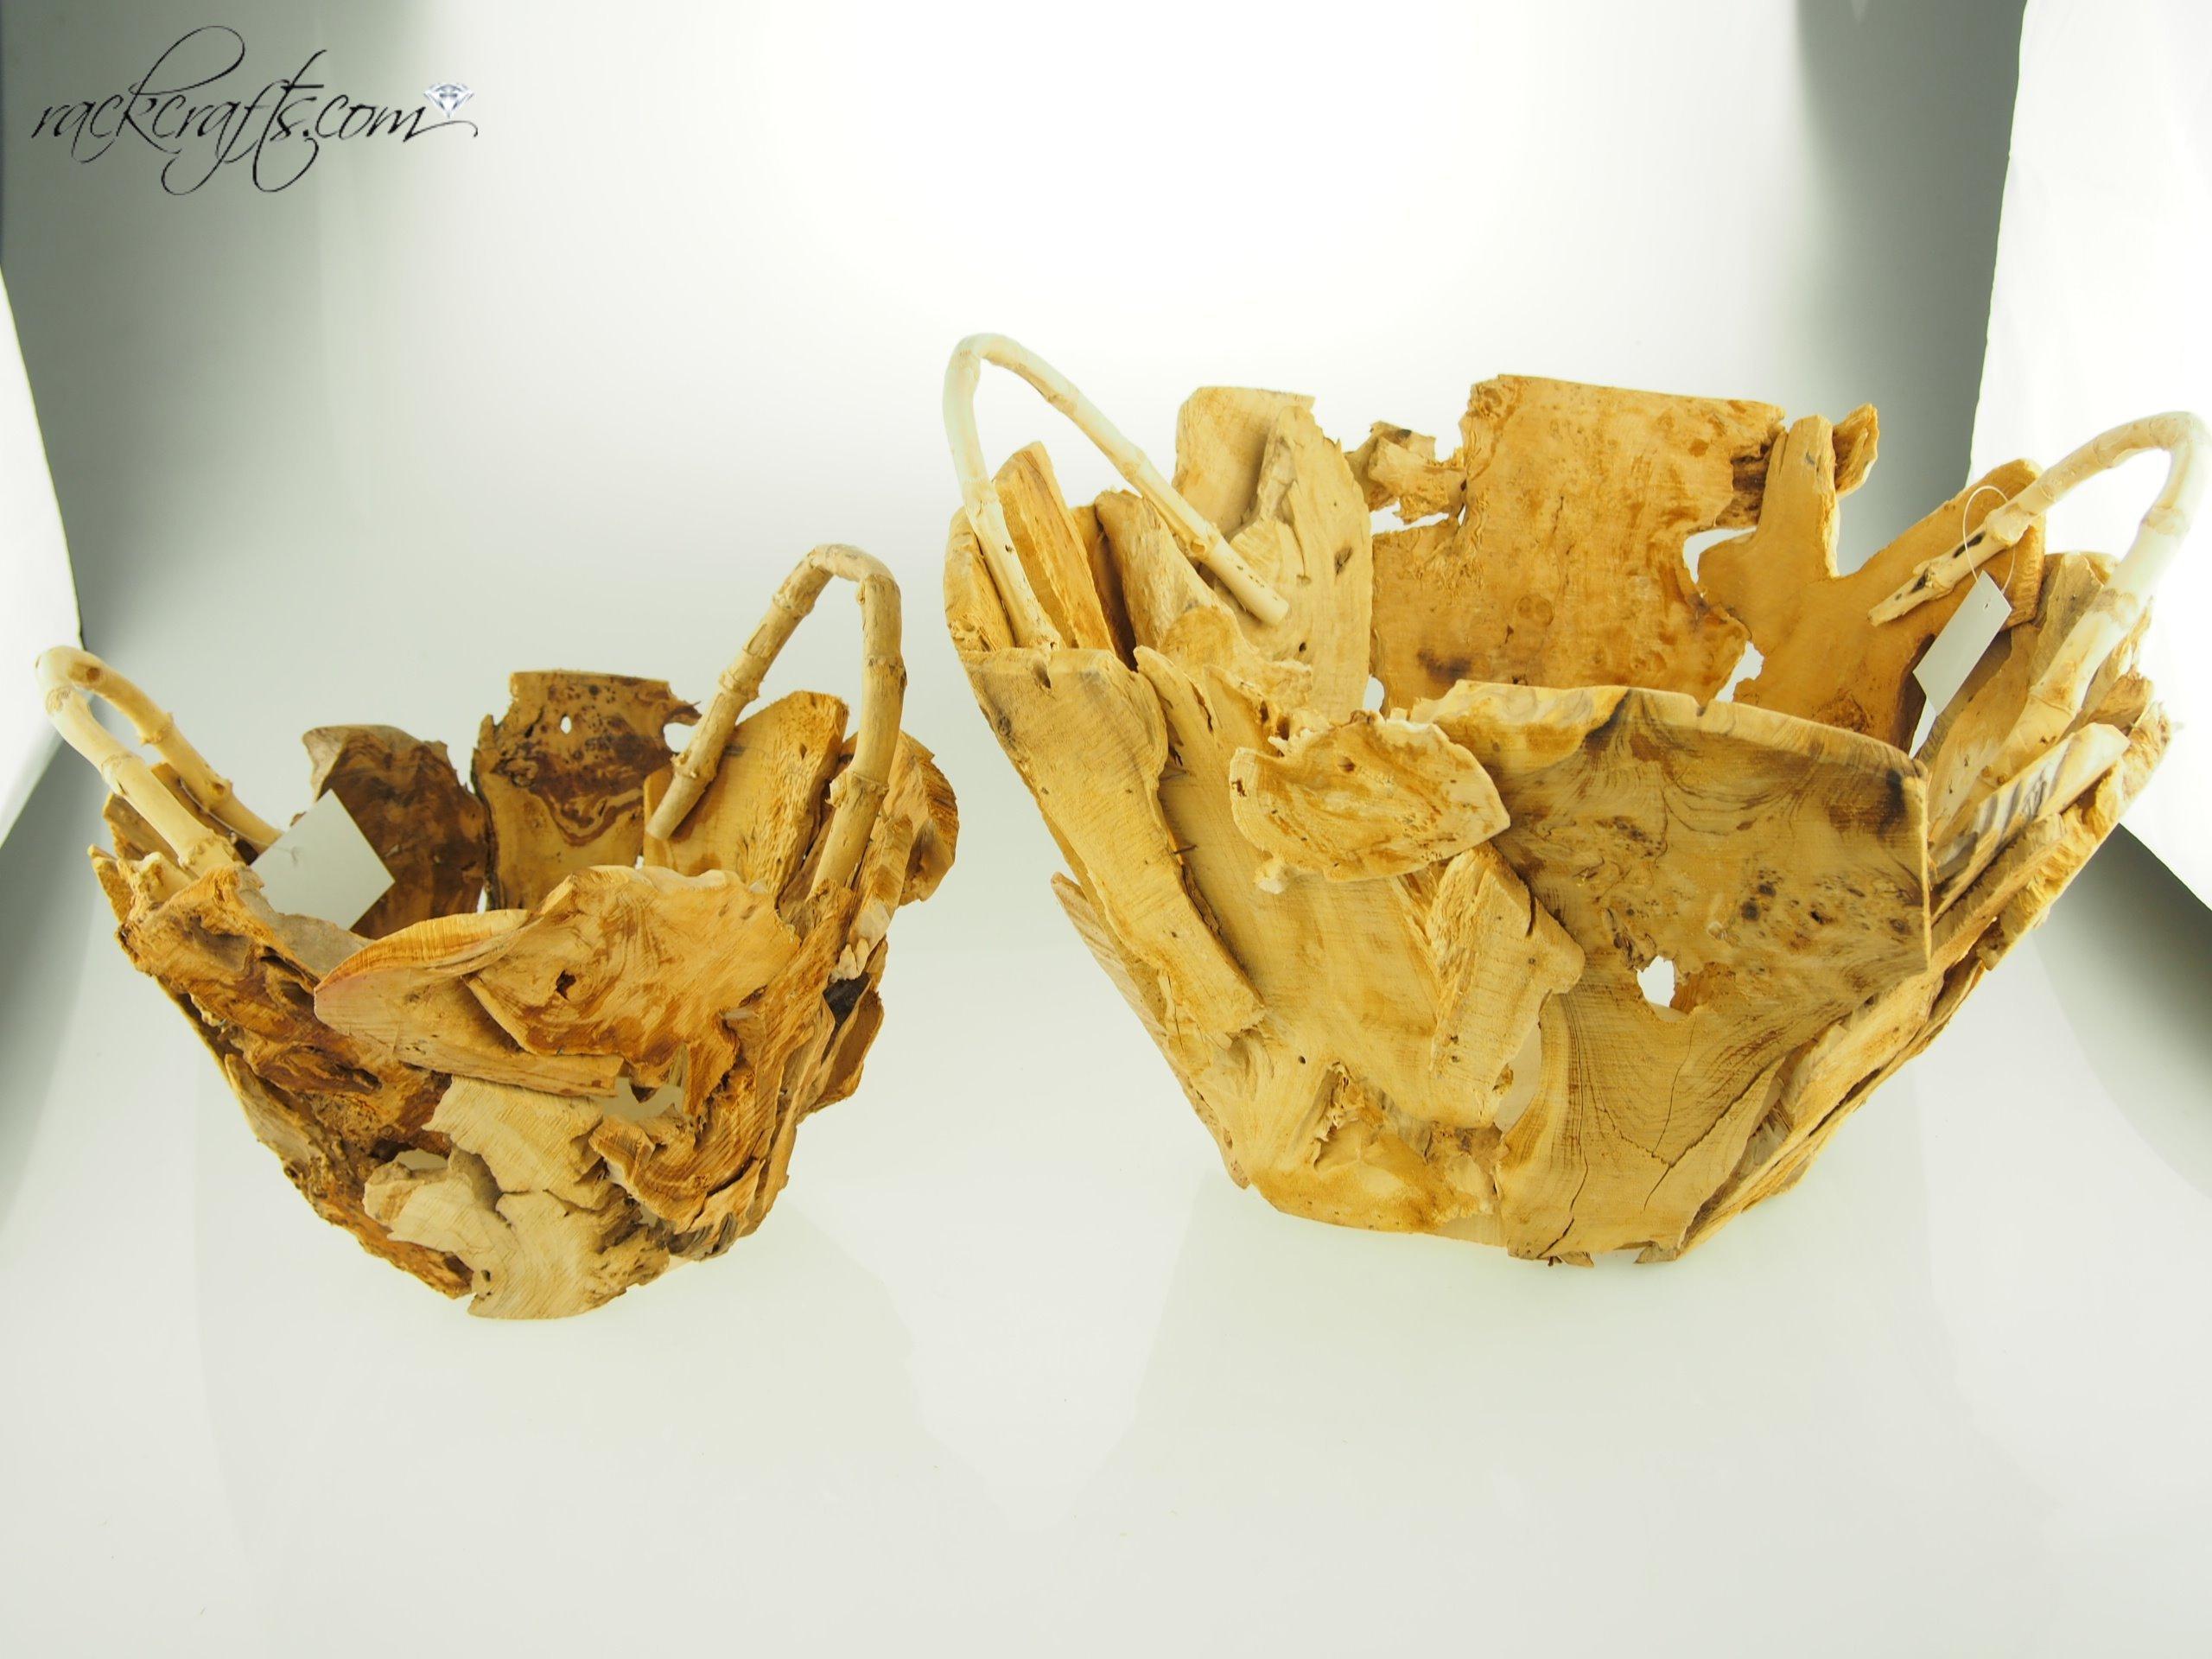 rackcrafts.com Decorative Wooden Baskets - 15.5'' Chipped Wood (2 pc set) Wedding Garden Flower Girl Basket by rackcrafts.com (Image #1)